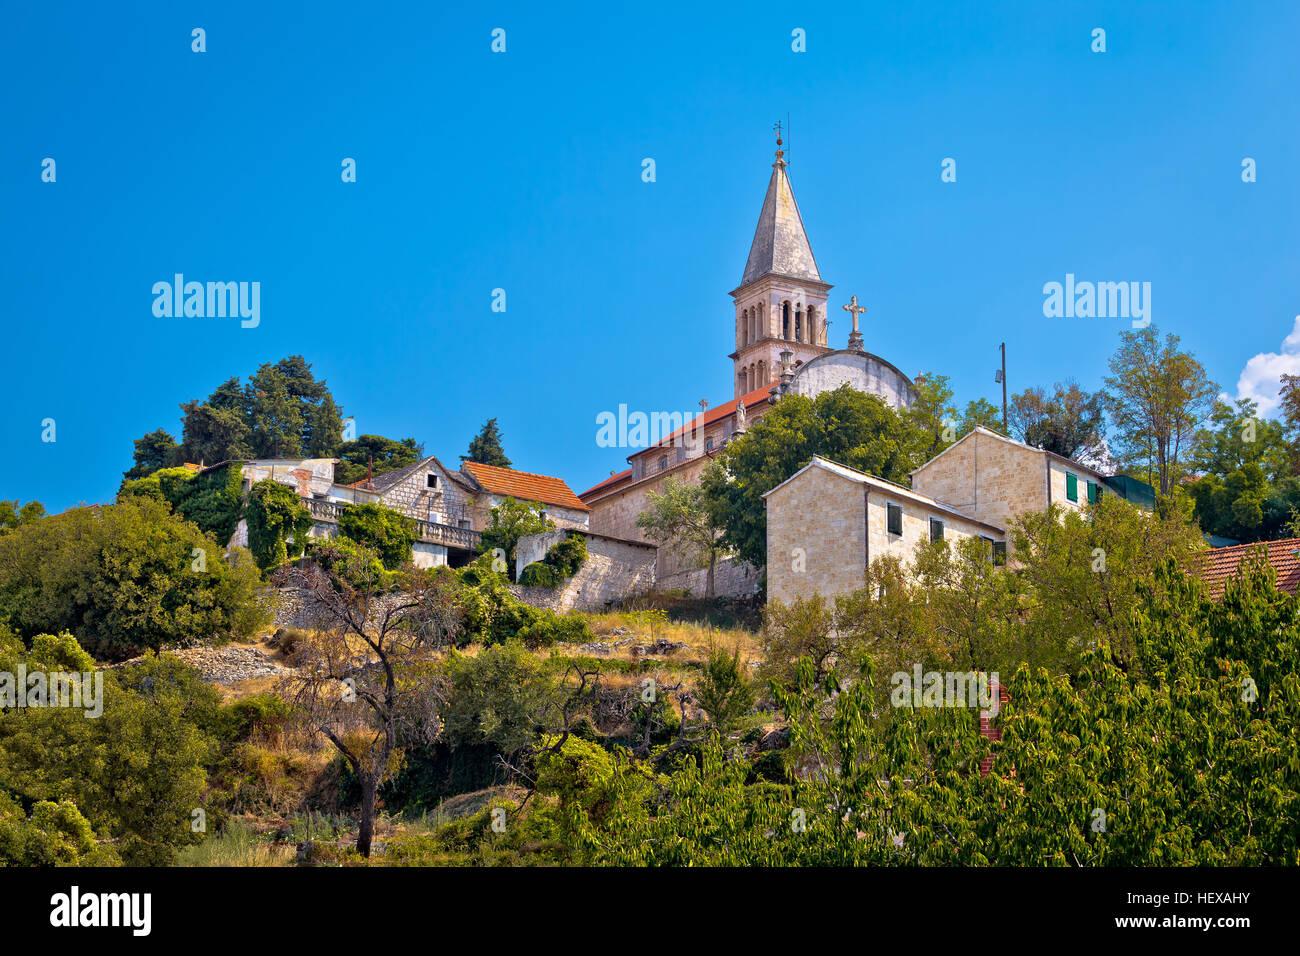 Aldea Nerezisca hitos en la isla de Brac, Dalmacia, Croacia Imagen De Stock